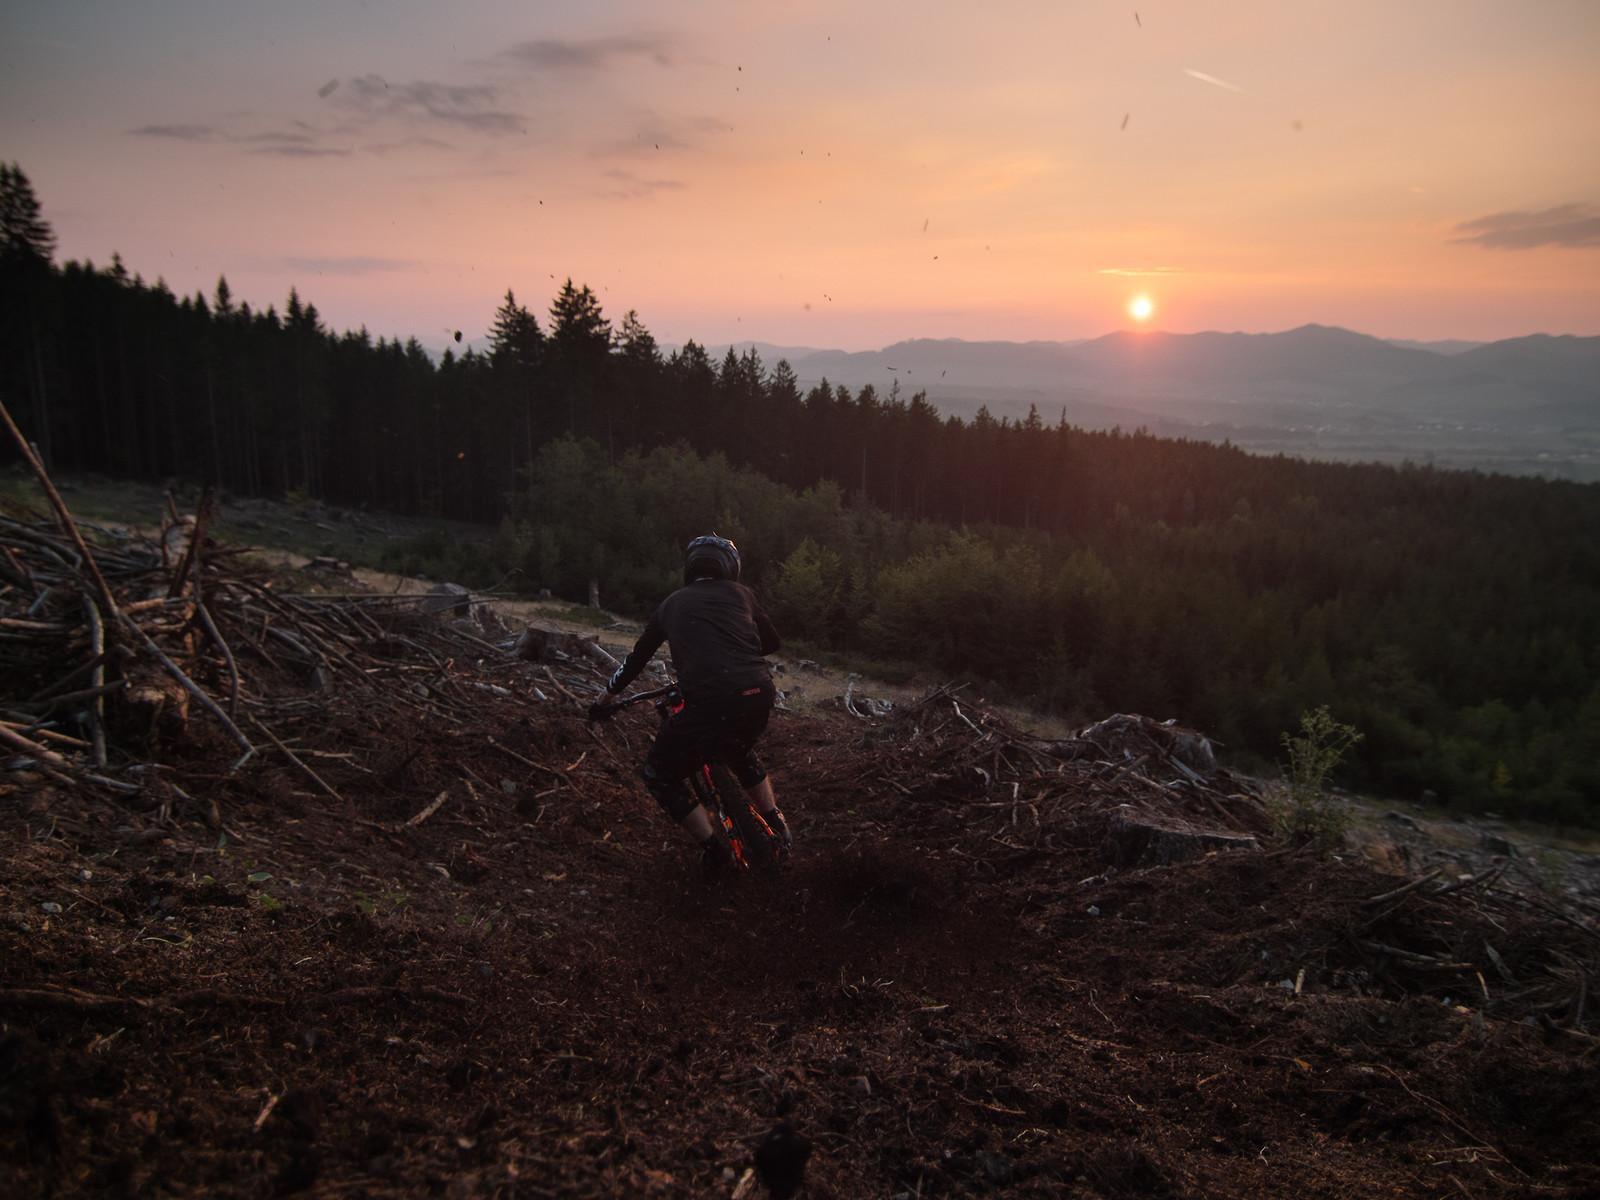 Last light  - EWIA - Mountain Biking Pictures - Vital MTB